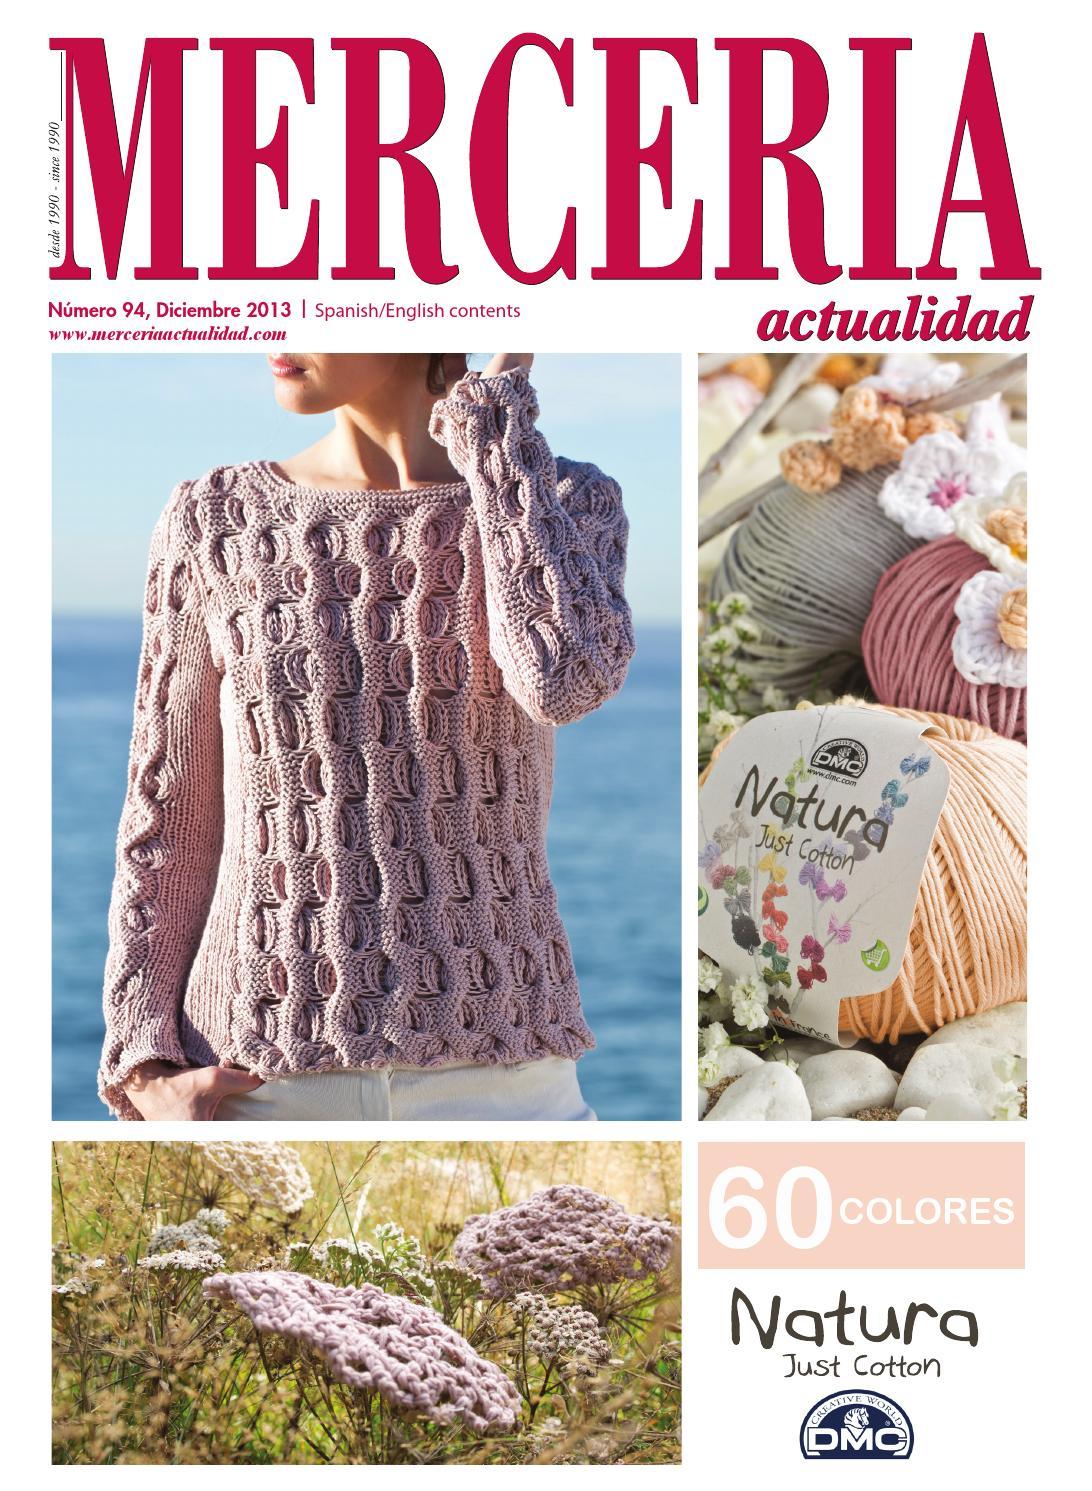 Clásica cuerda bufanda de 100/% lana merino con flecos-marrón//azul a rayas